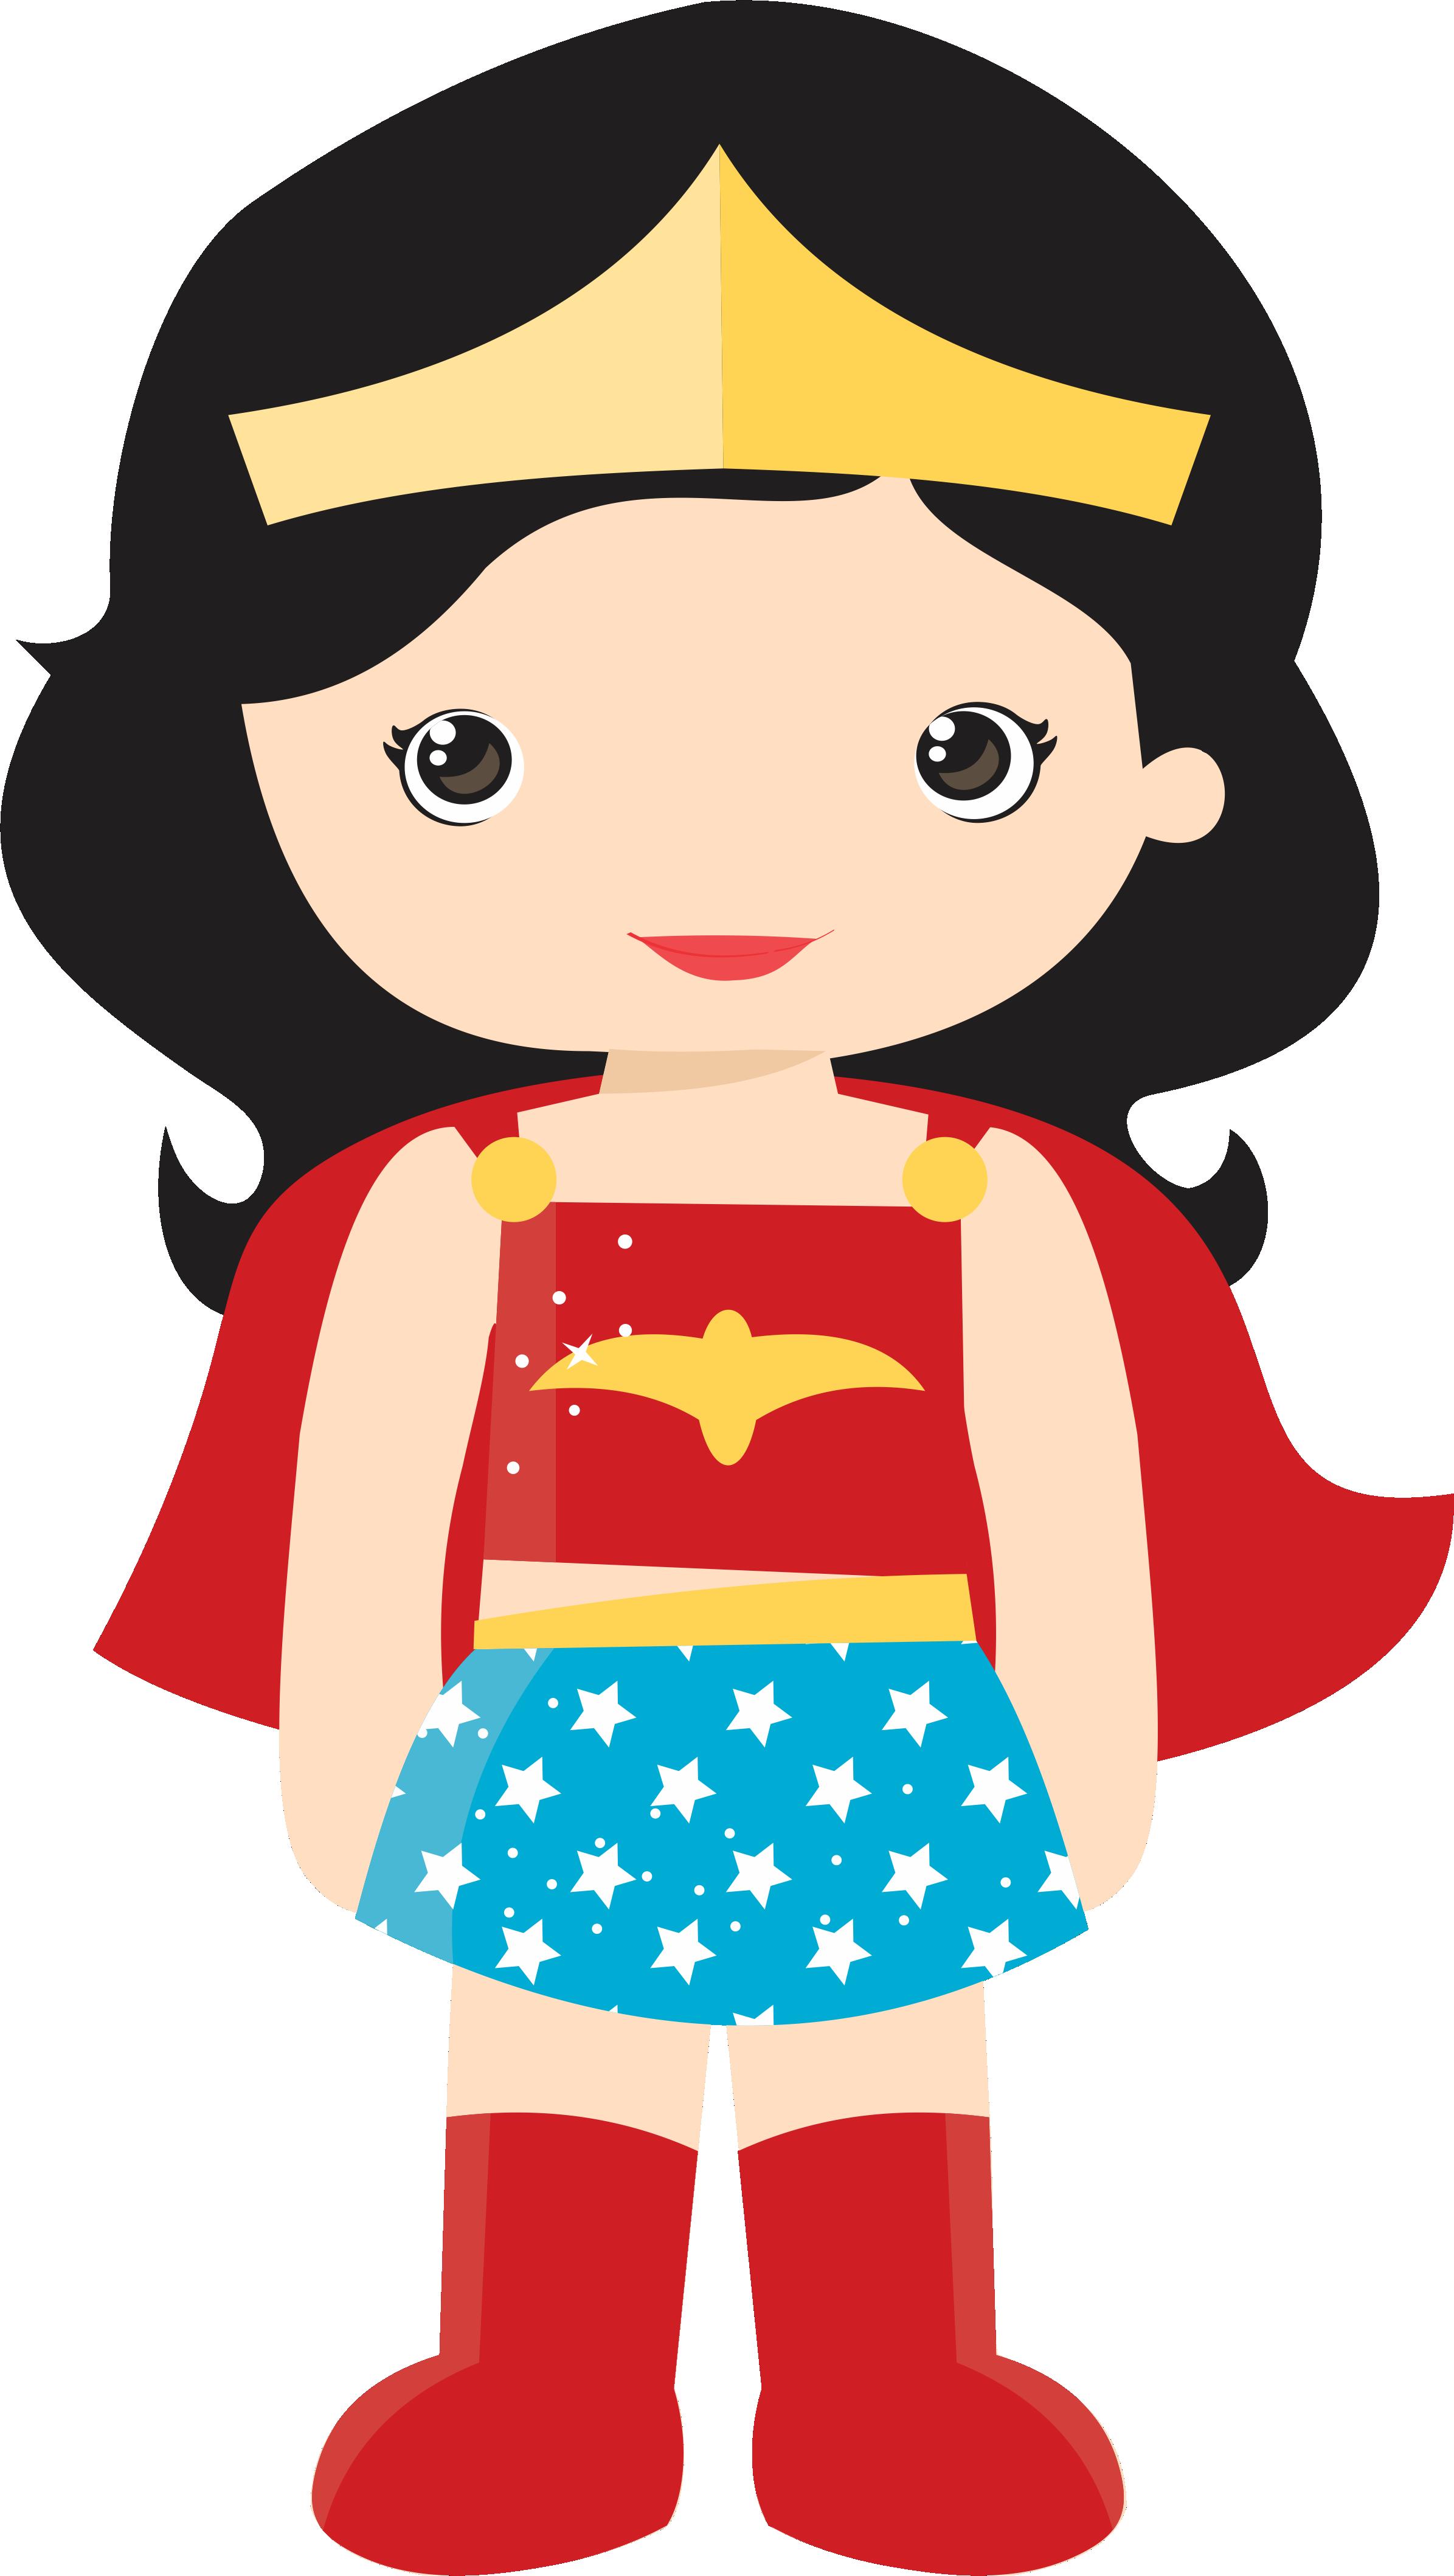 Esta Em Png Disponivel Mulher Maravilha Festa De Aniversario De Super Heroi Festa De Super Herois